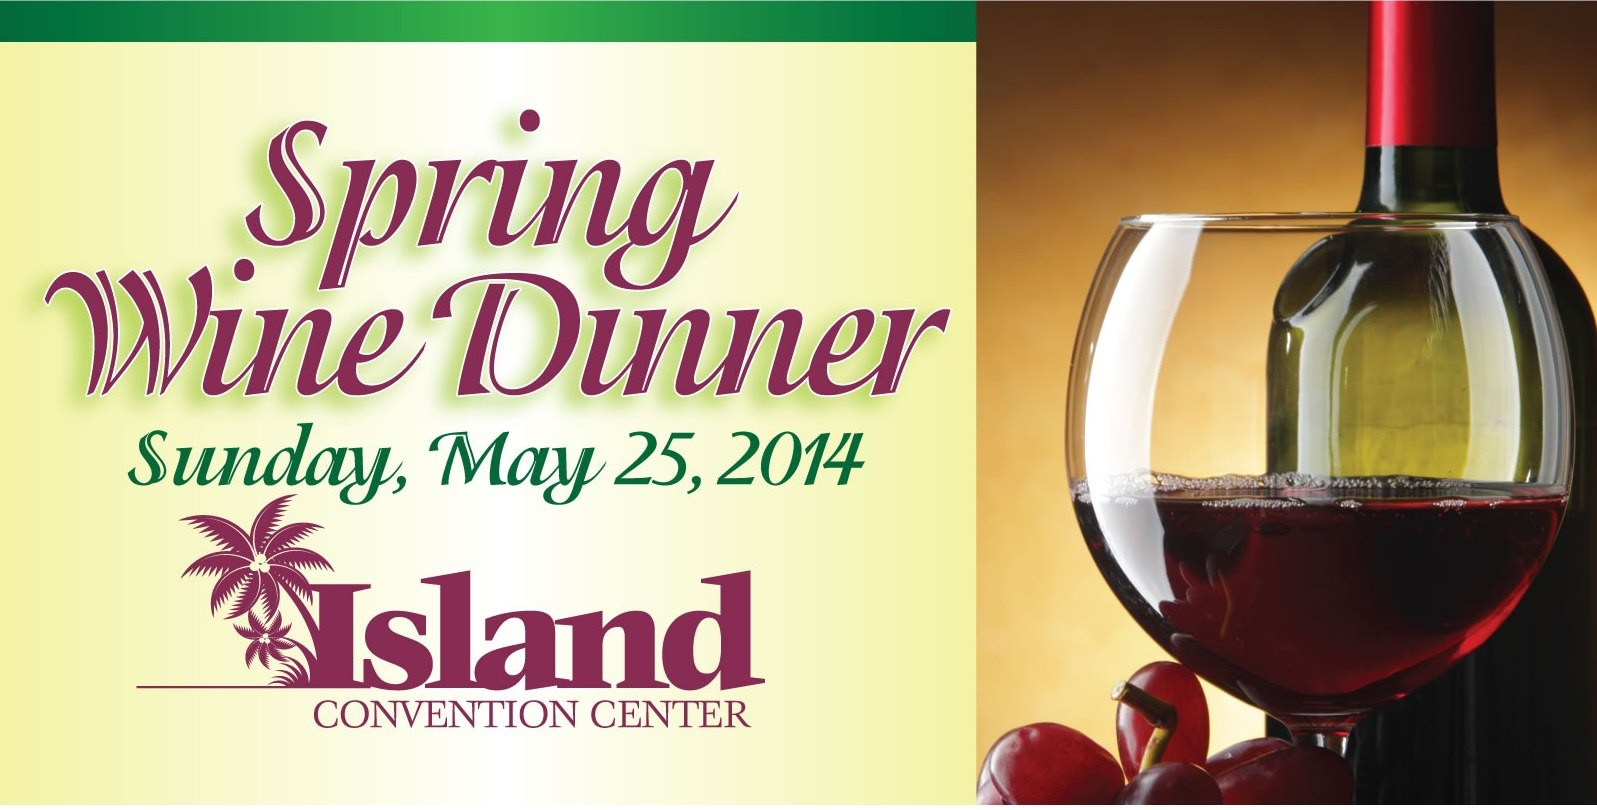 Spring Wine Dinner Web Image  (3)